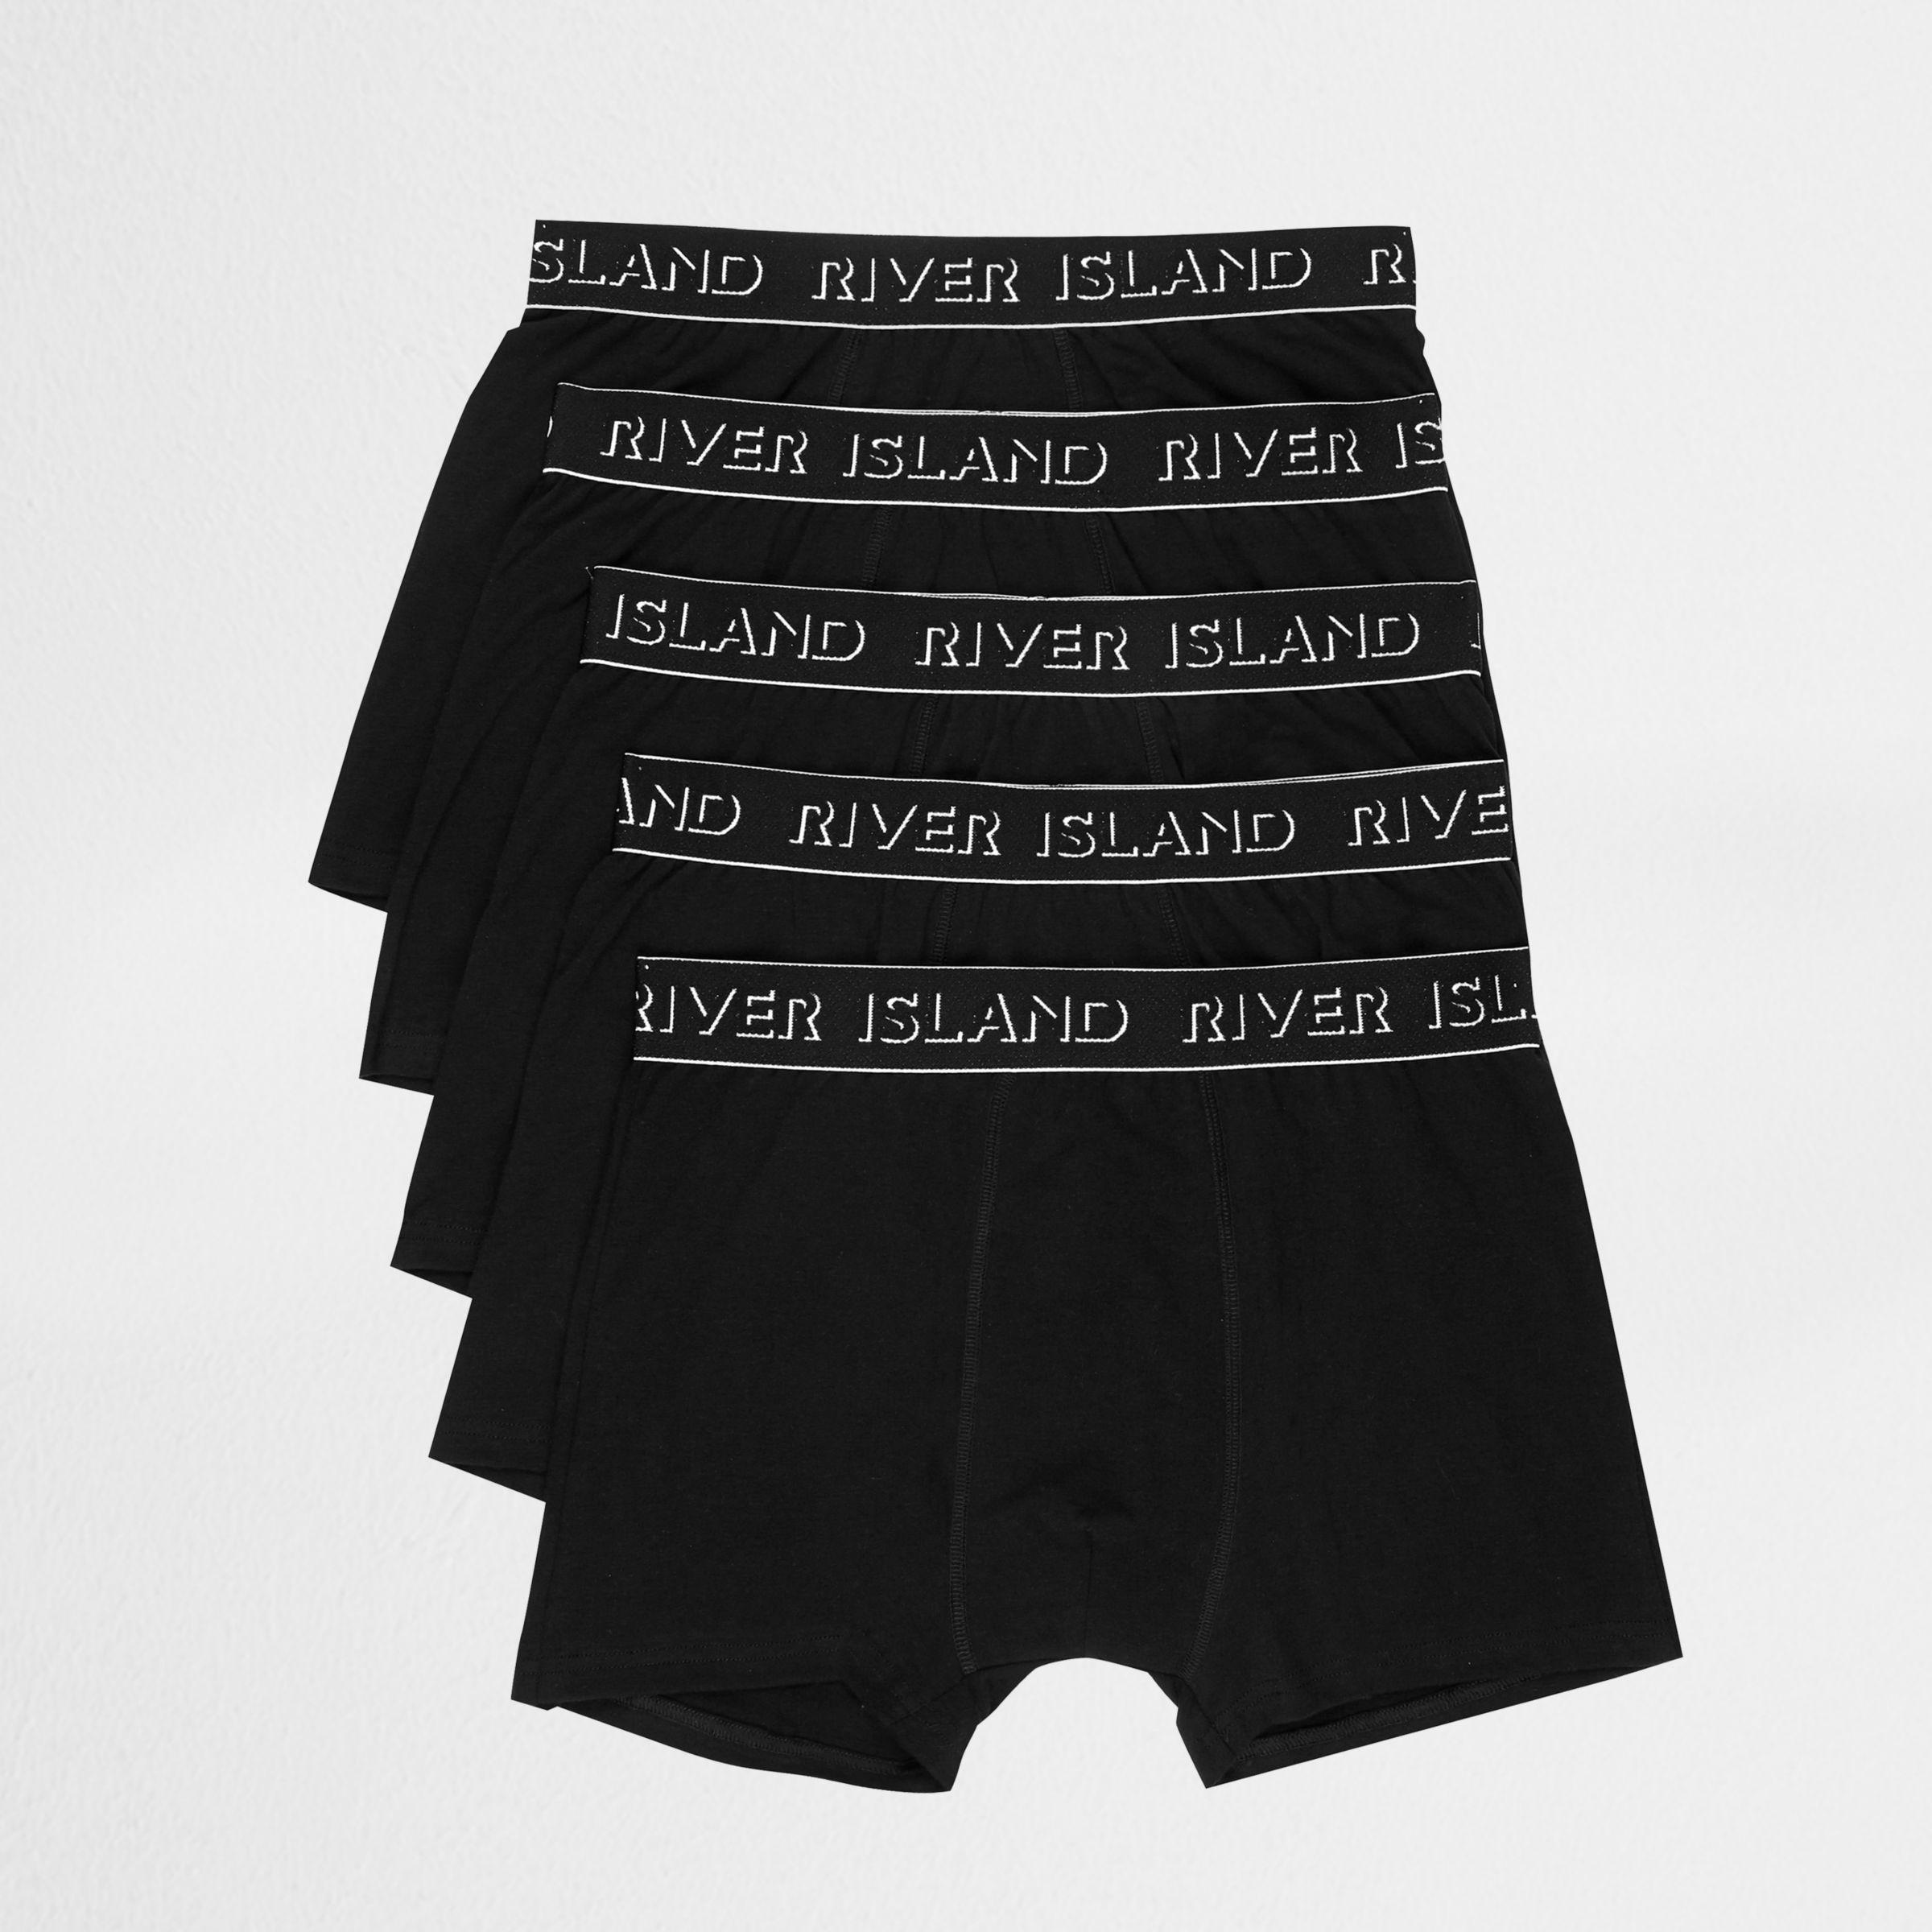 Mens Navy RI branded waistband trunks multipack River Island Deals Online YRa5Wz